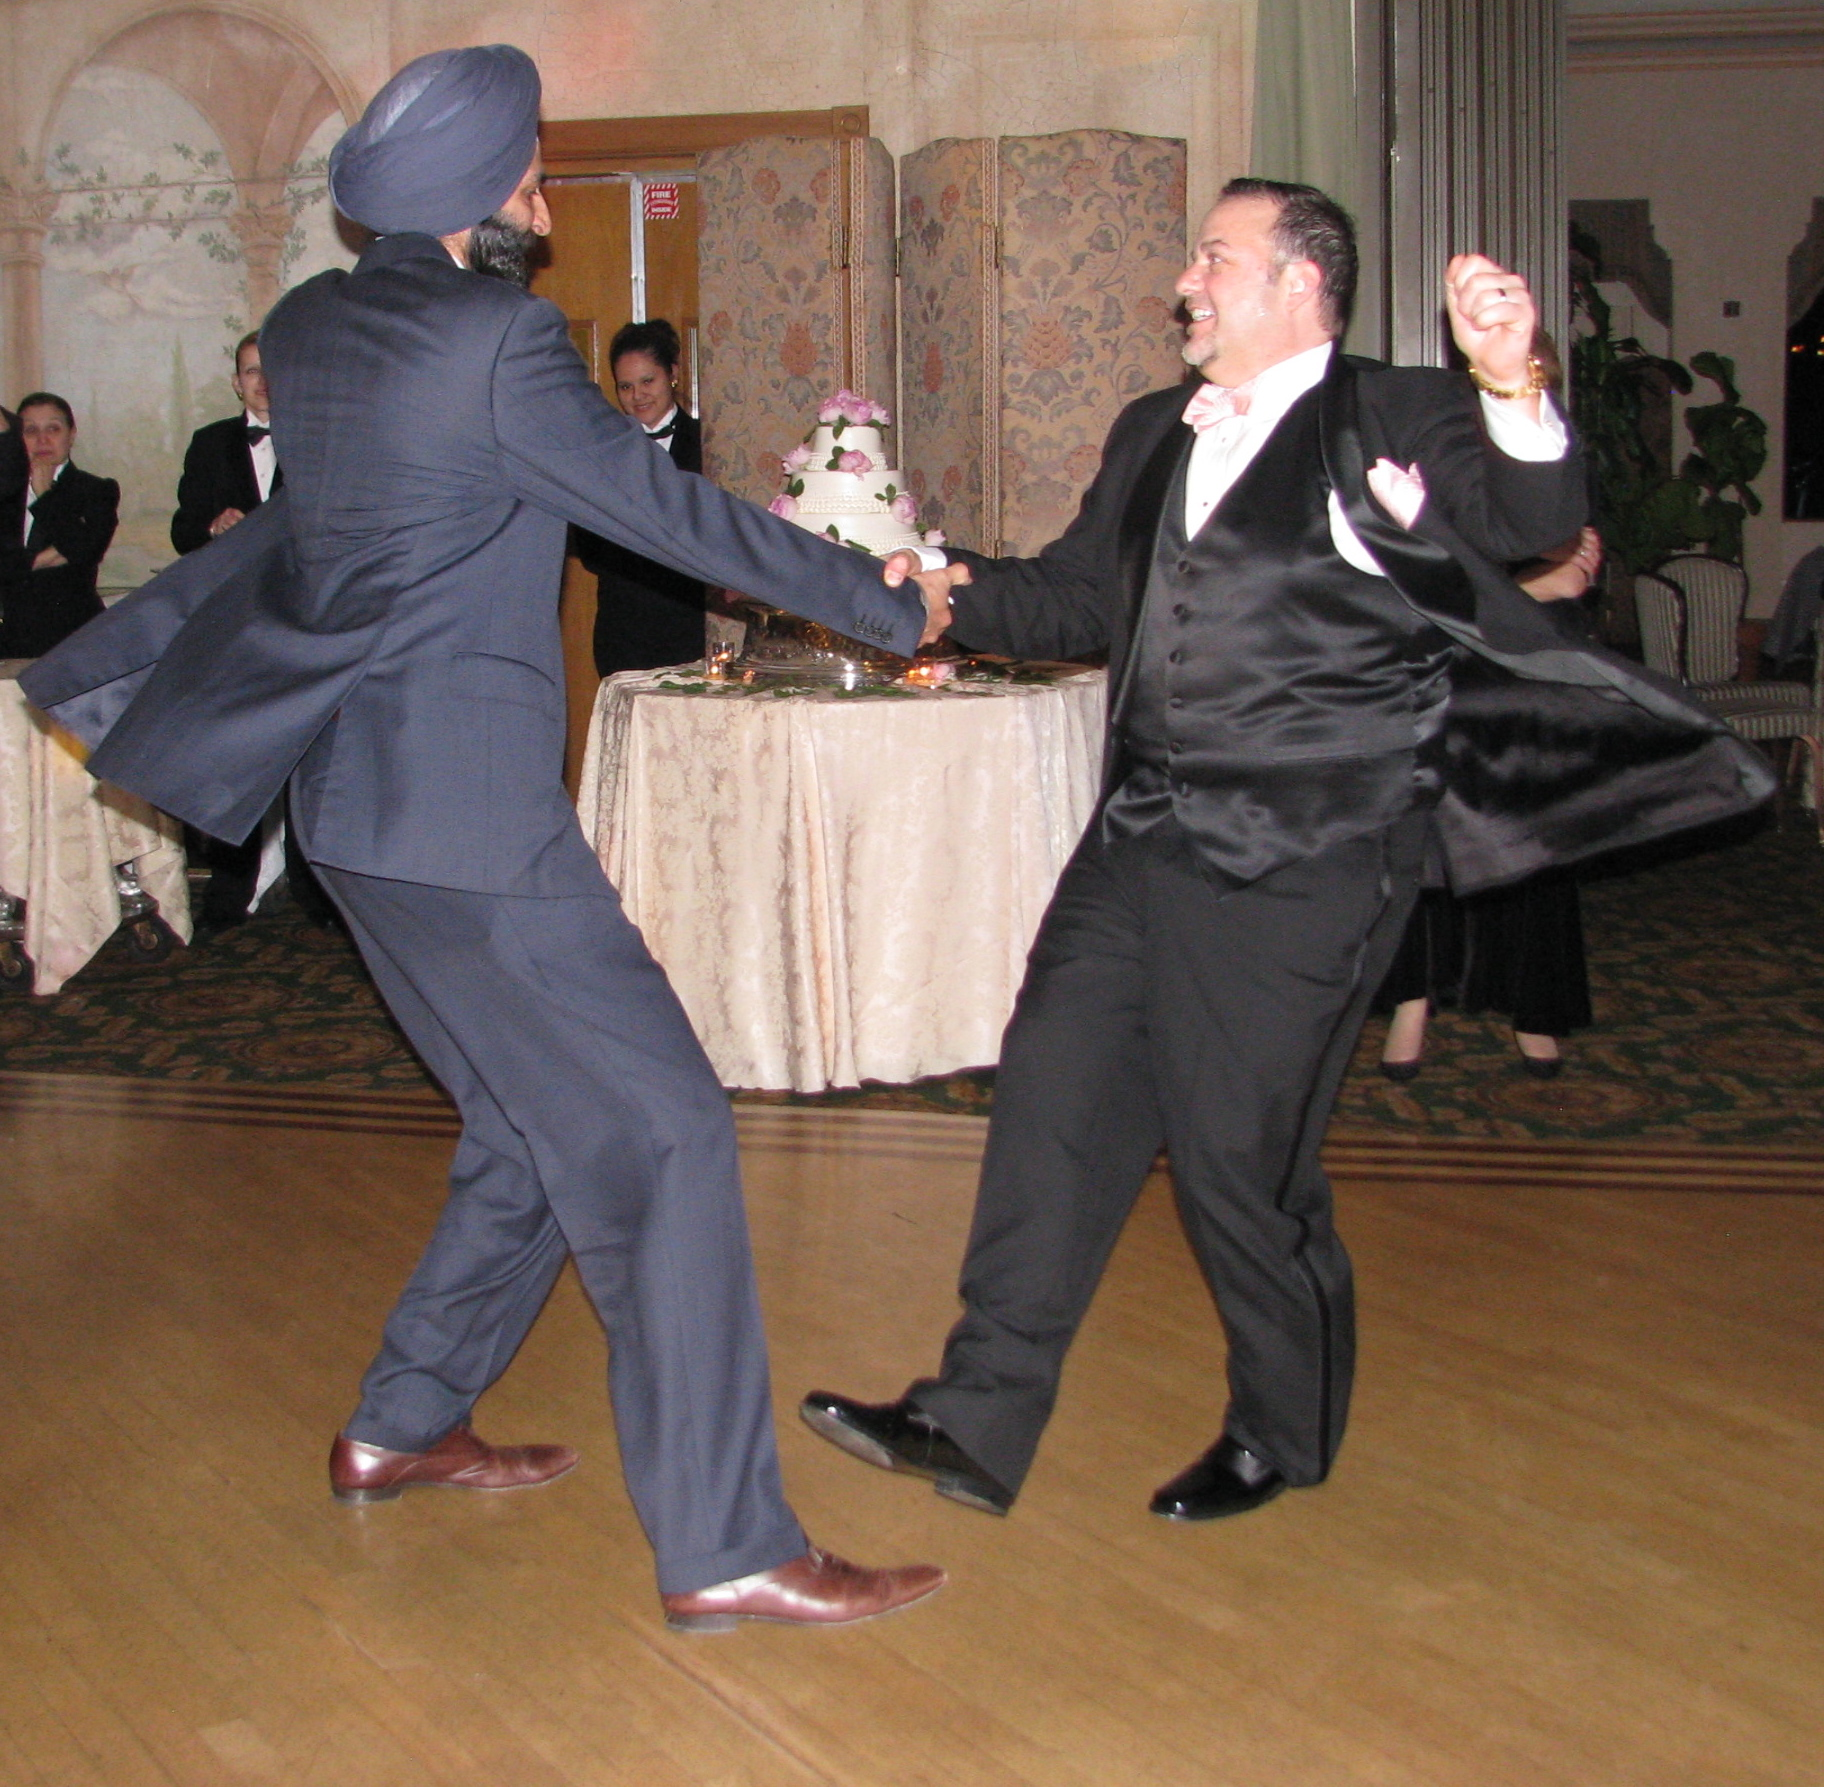 Rhode Island Wedding Dj Fun Rhode: Wedding DJs: How To Book The Right One For You